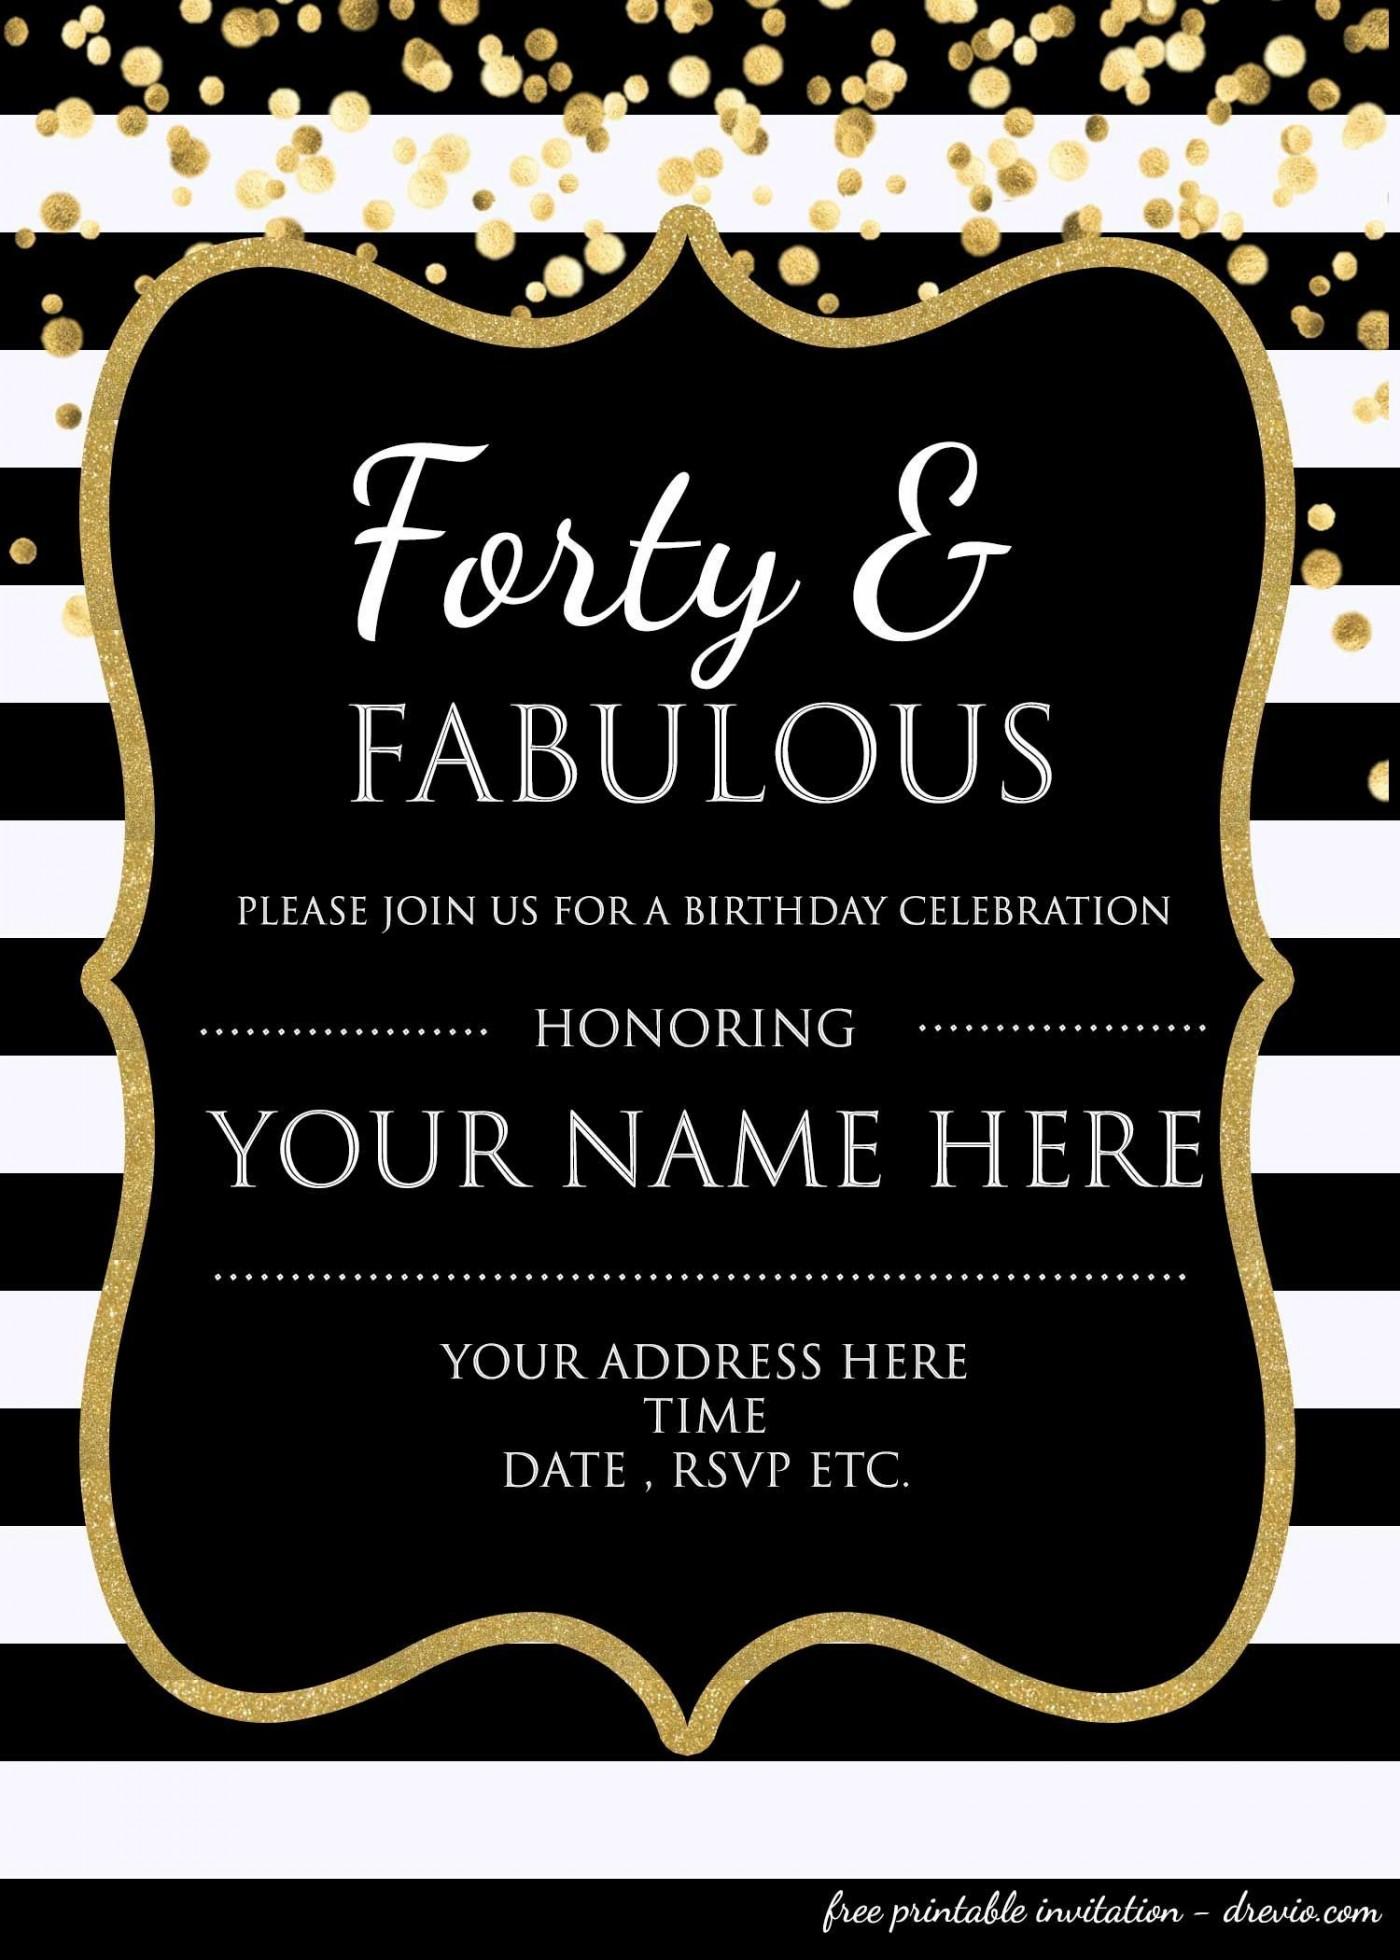 007 Impressive 40th Birthday Party Invite Template Free Inspiration 1400